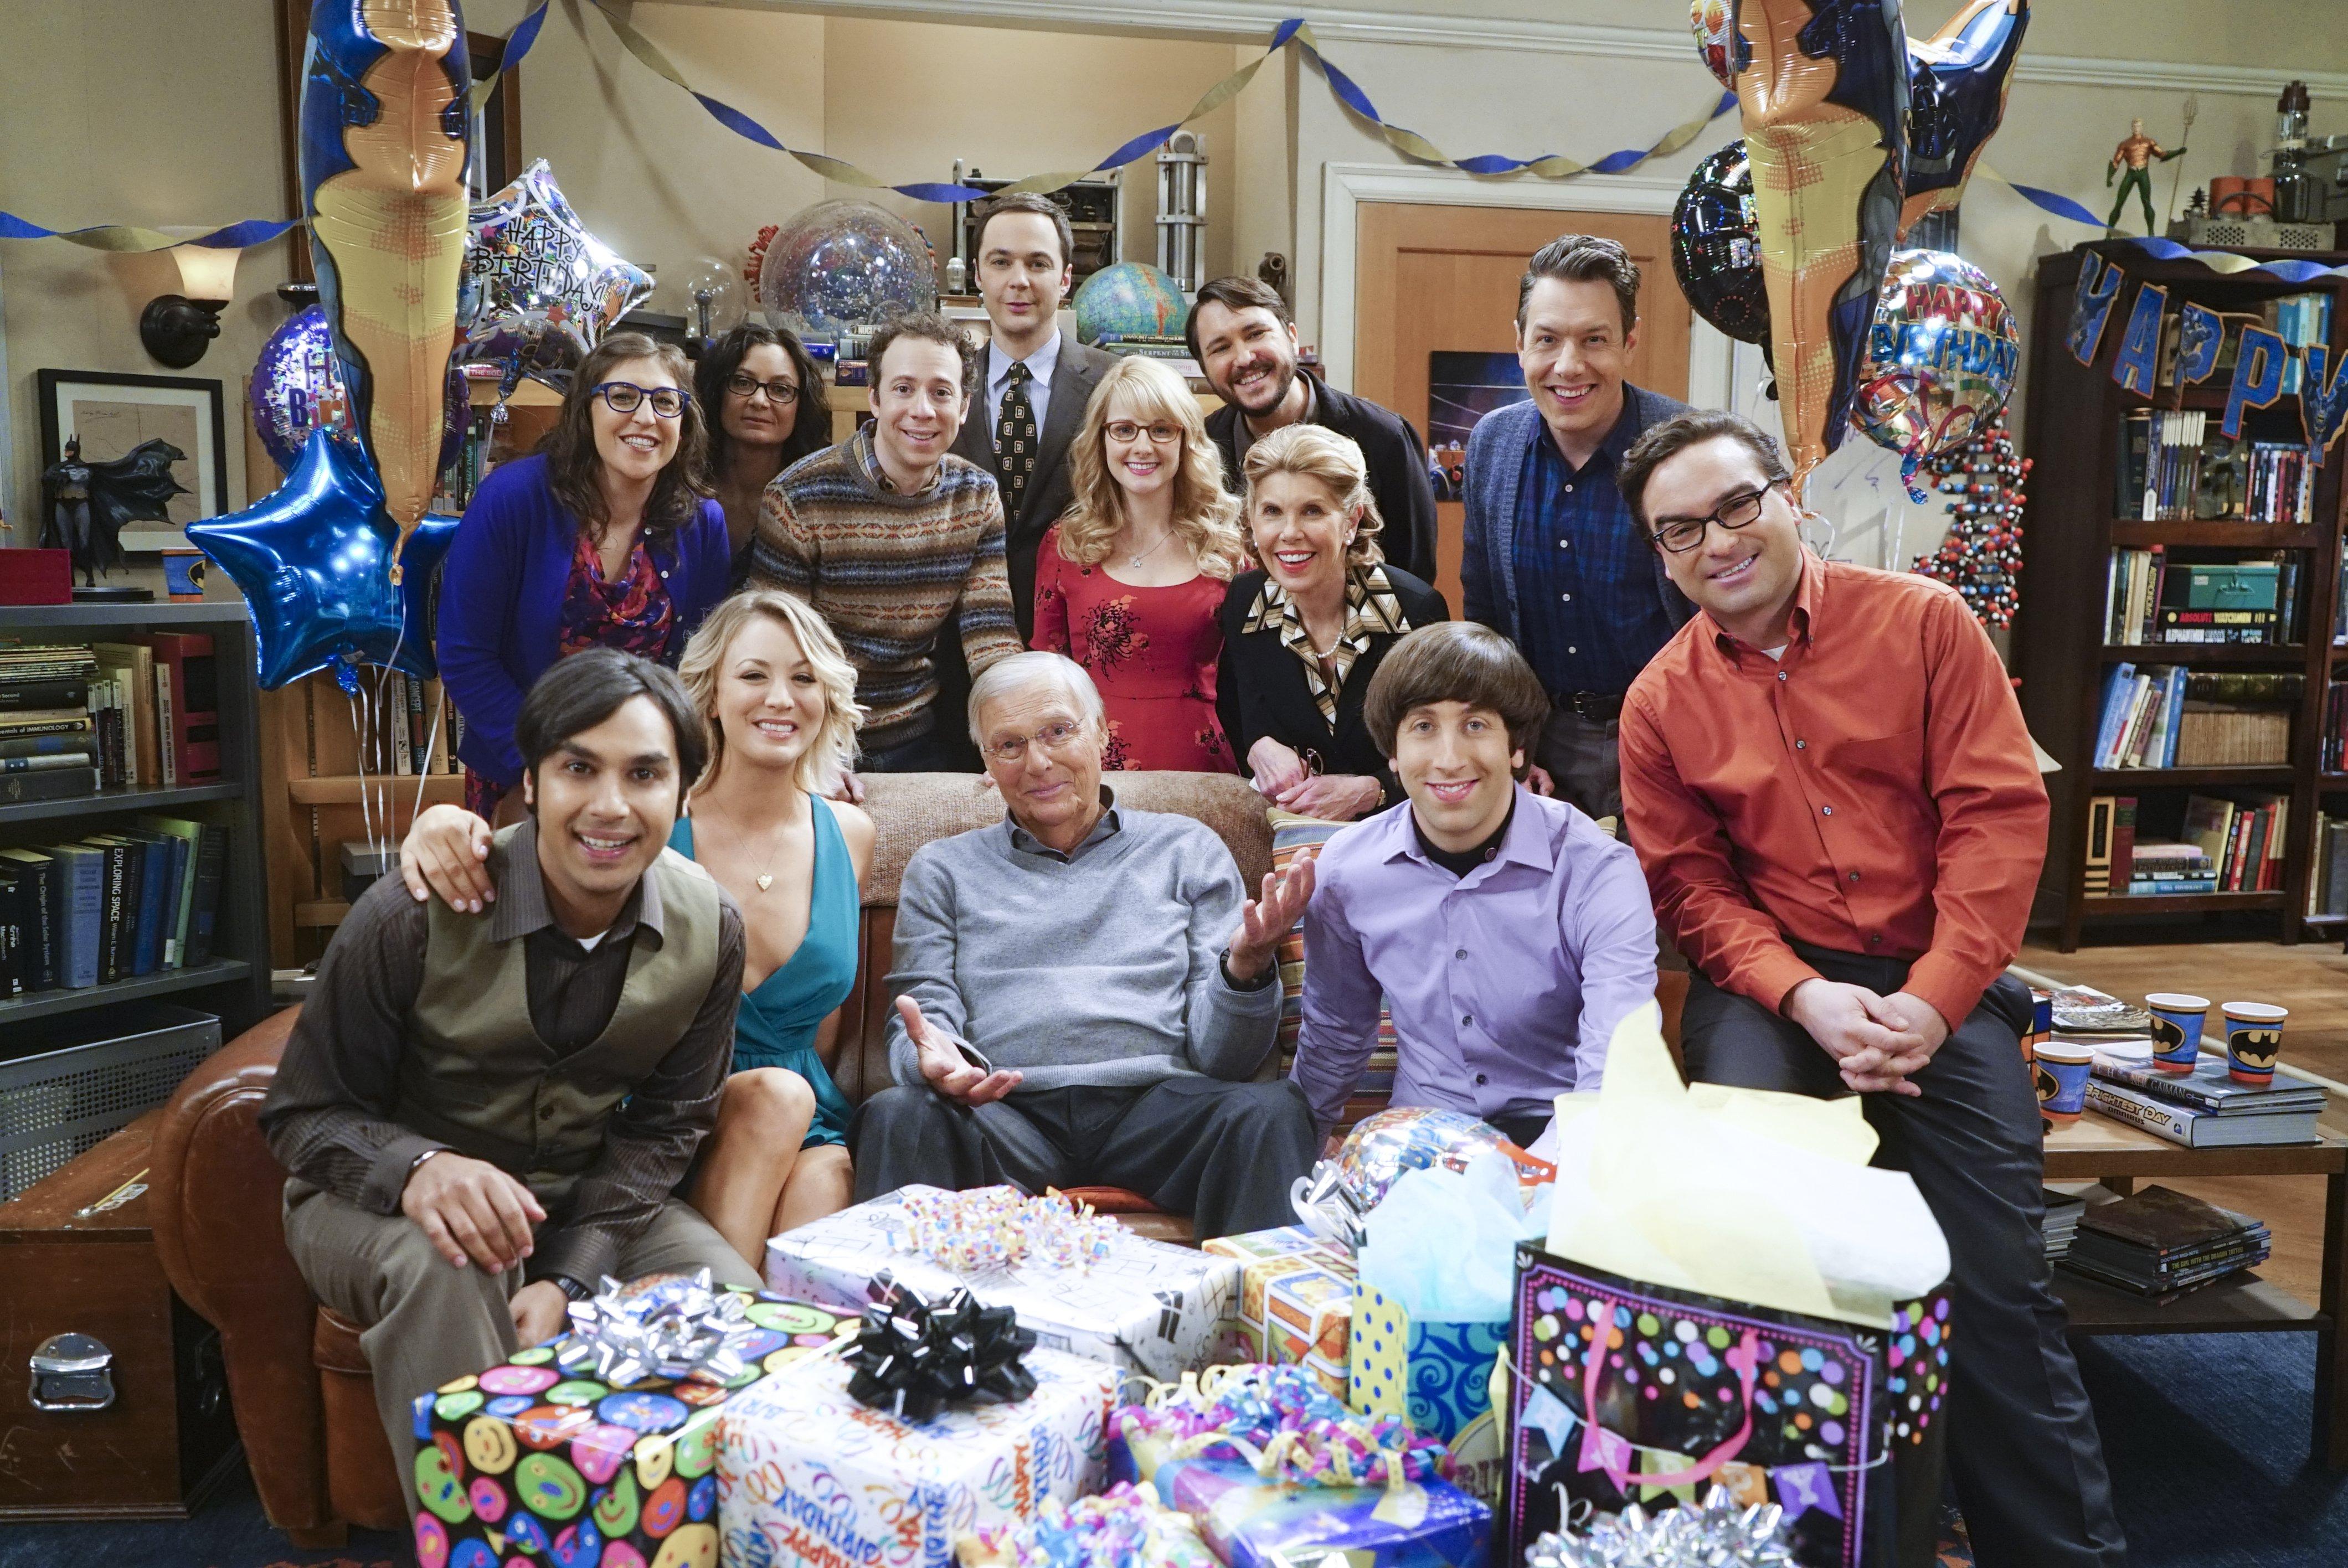 The Big Bang Theory - Series 09 Episode 17 The Celebration Experimentation Characters names Sheldon, Penny, Leonard, Howard, Raj © Warner Bros. Entertainment, Inc.  TL